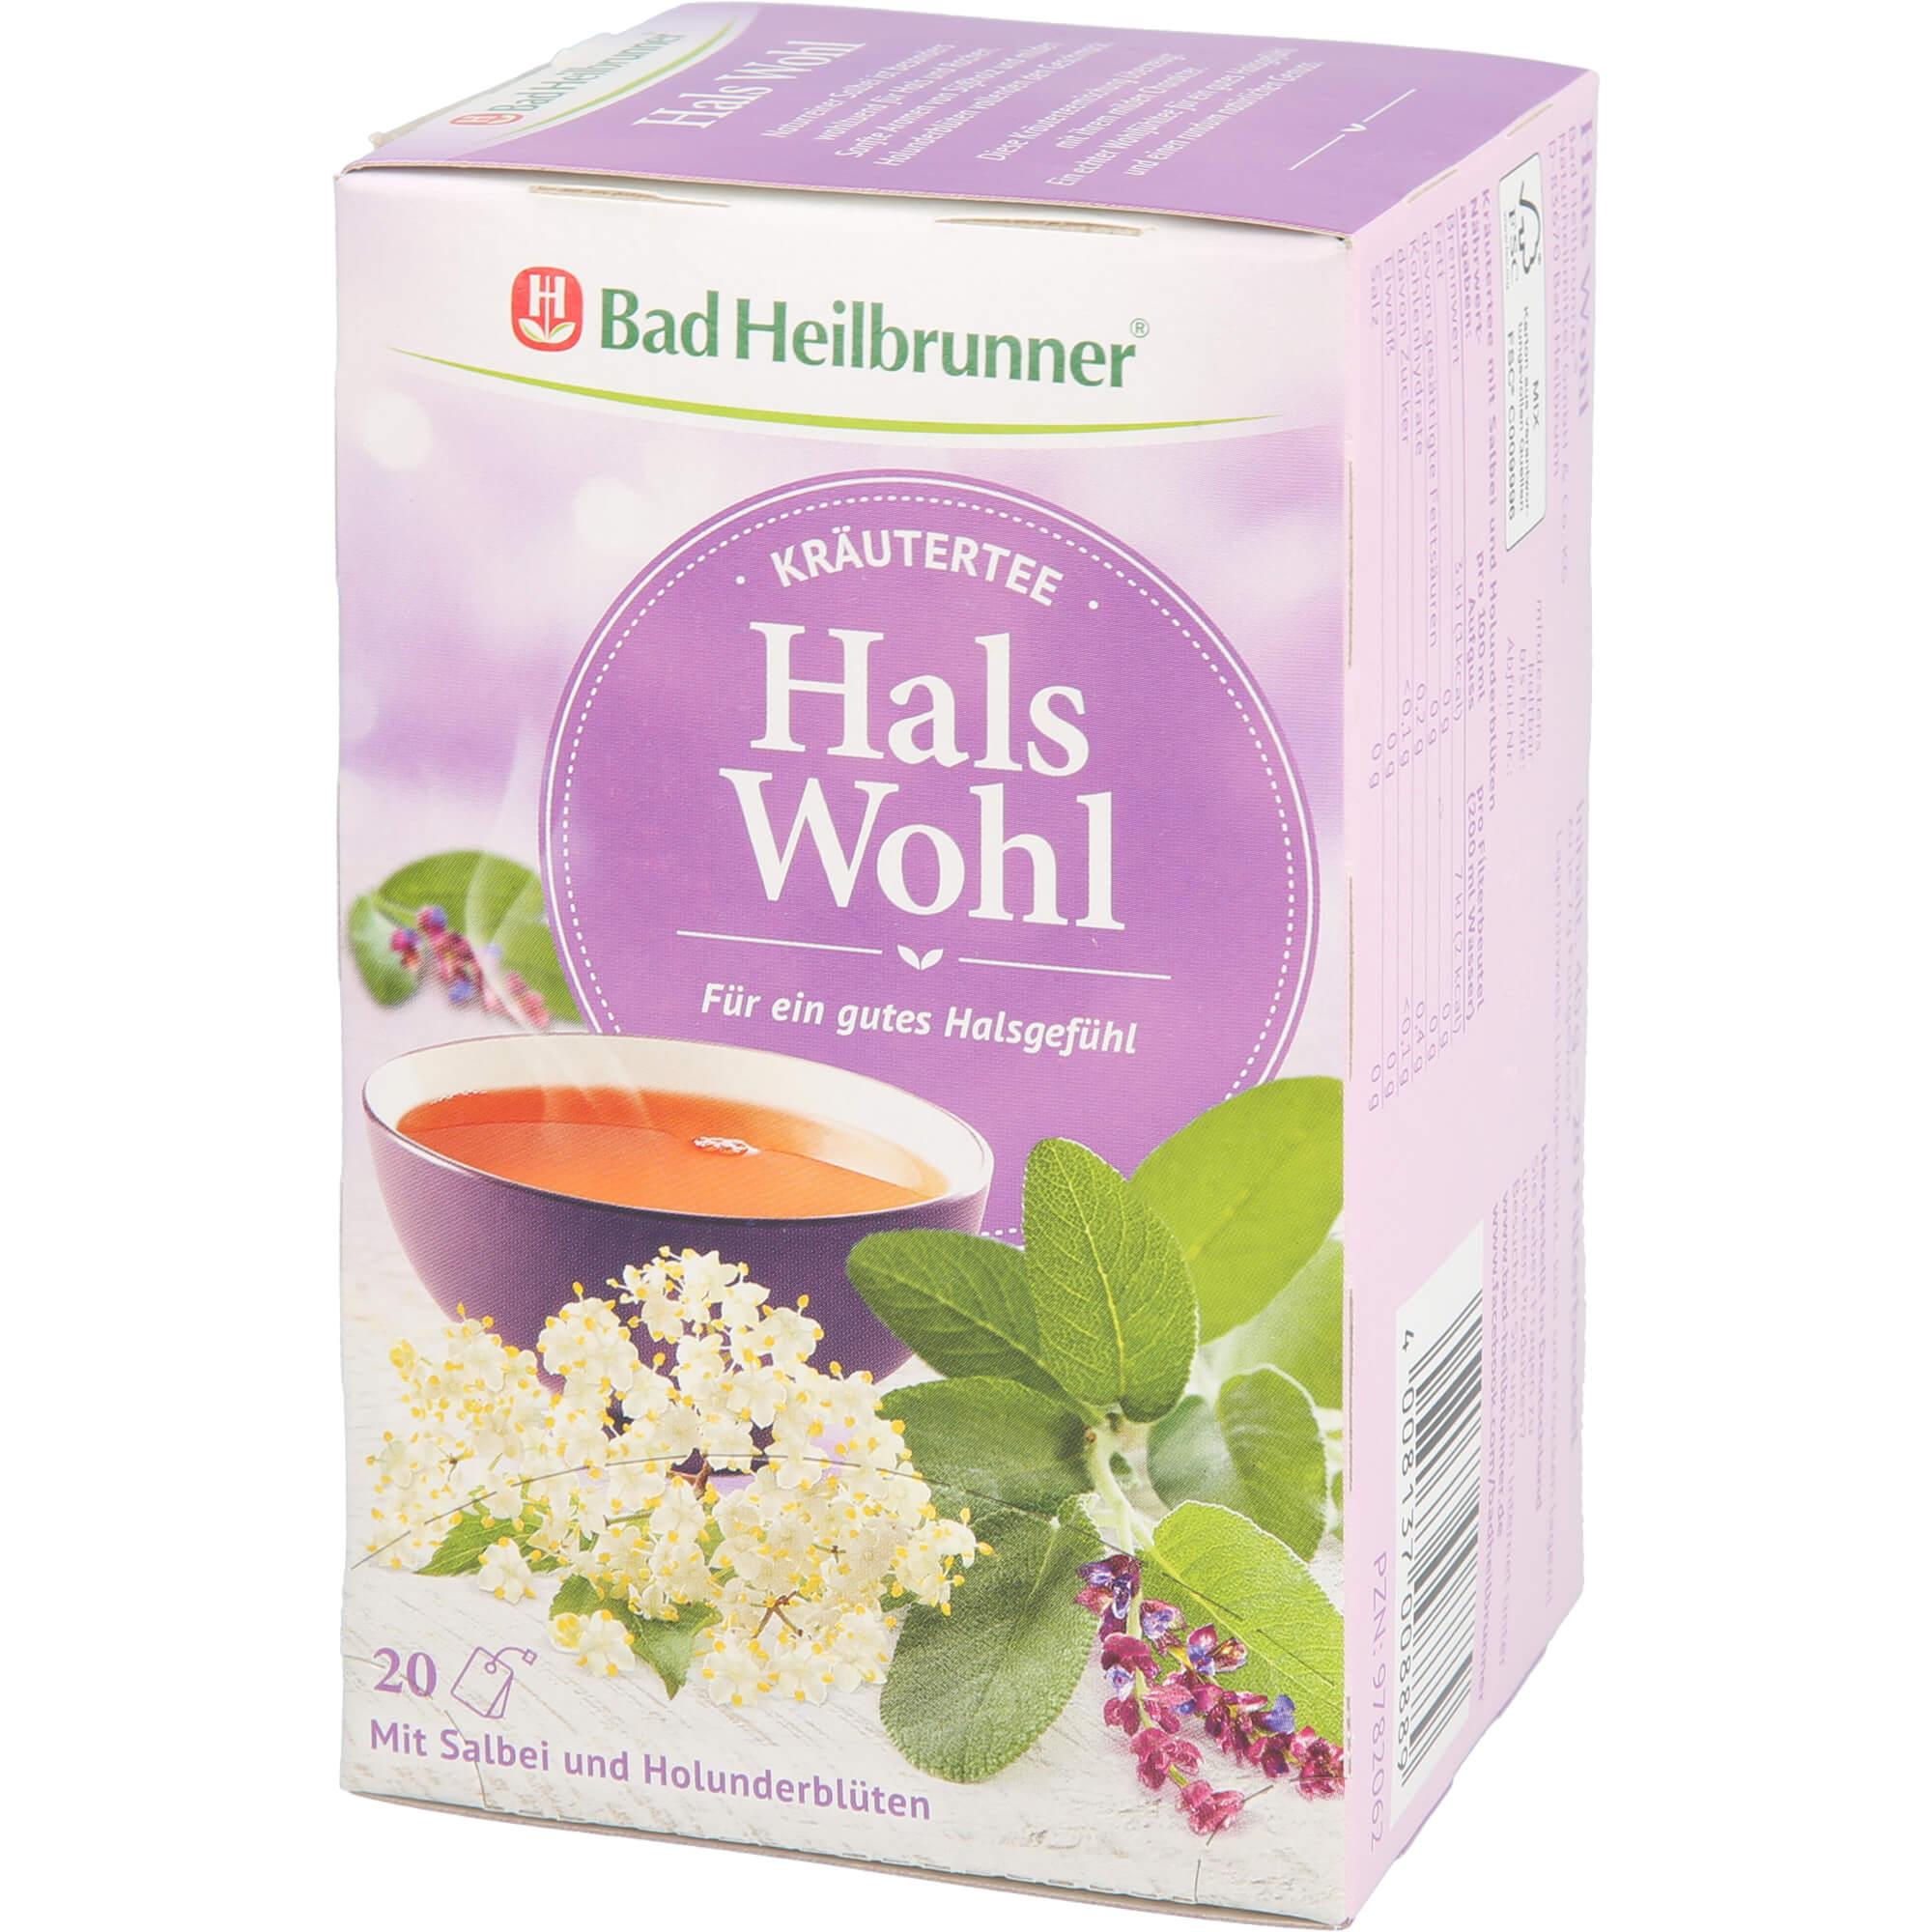 BAD HEILBRUNNER Kräutertee Hals Wohl Filterbeutel